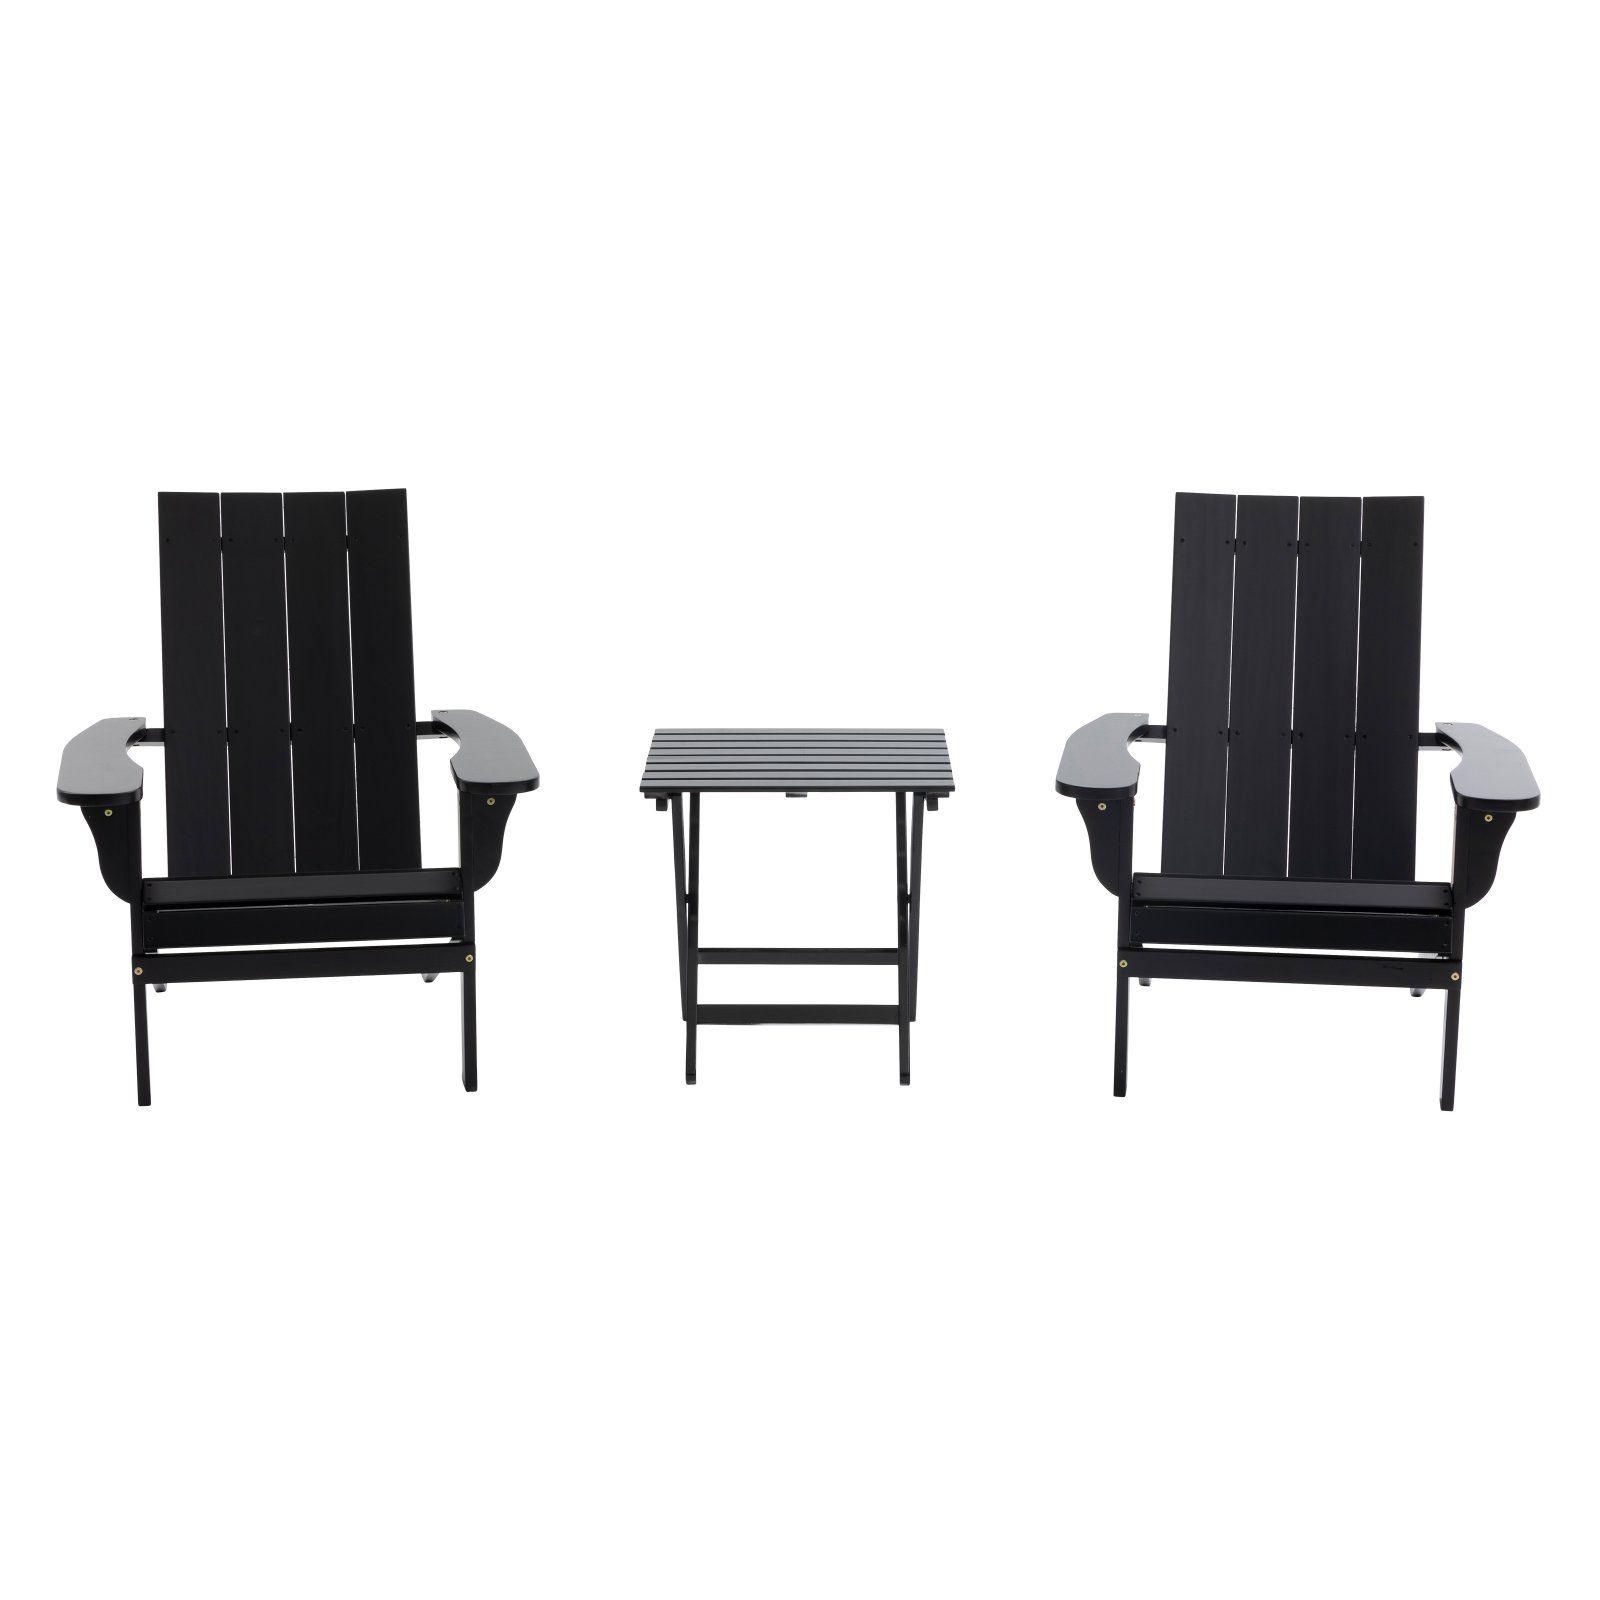 Outdoor Belham Living Portside Modern Adirondack Chairs Free